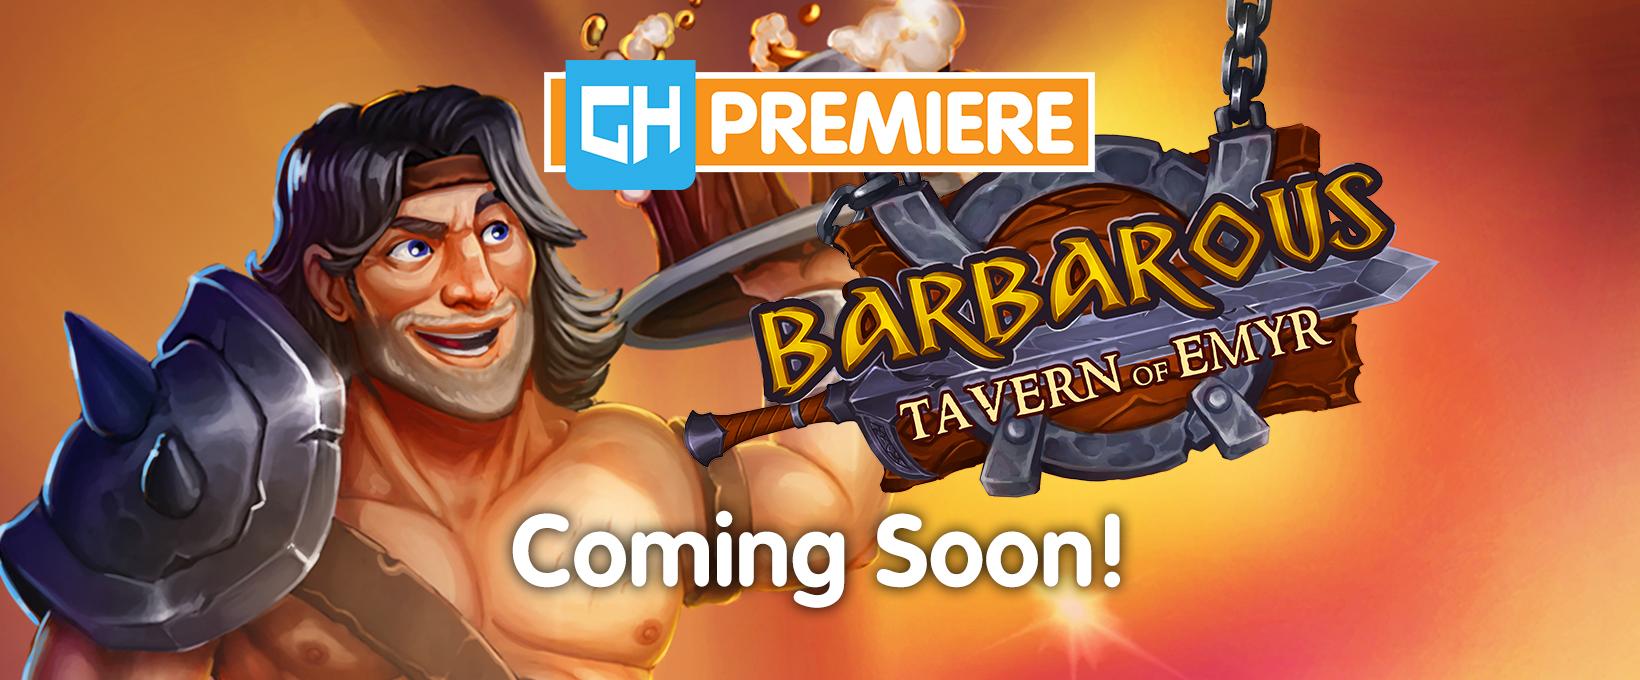 Barbarous - Tavern of Emyr - GameHouse Premiere